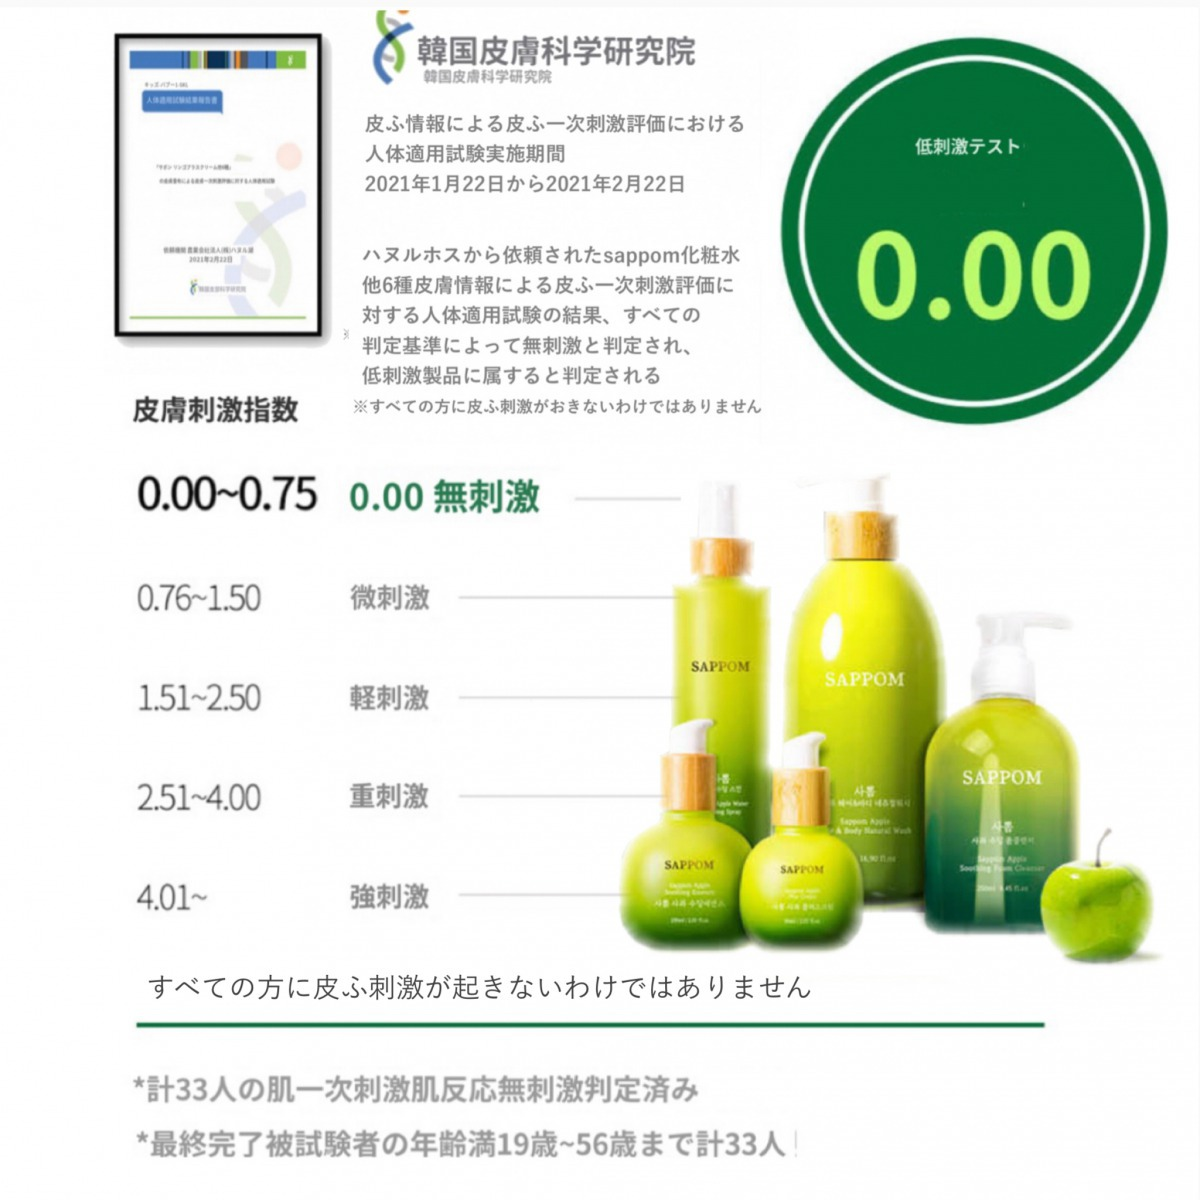 10%off ポータブル SAPPOM 安らぎシャンプー 50g 一包入 ポータブルサイズ 単品商品